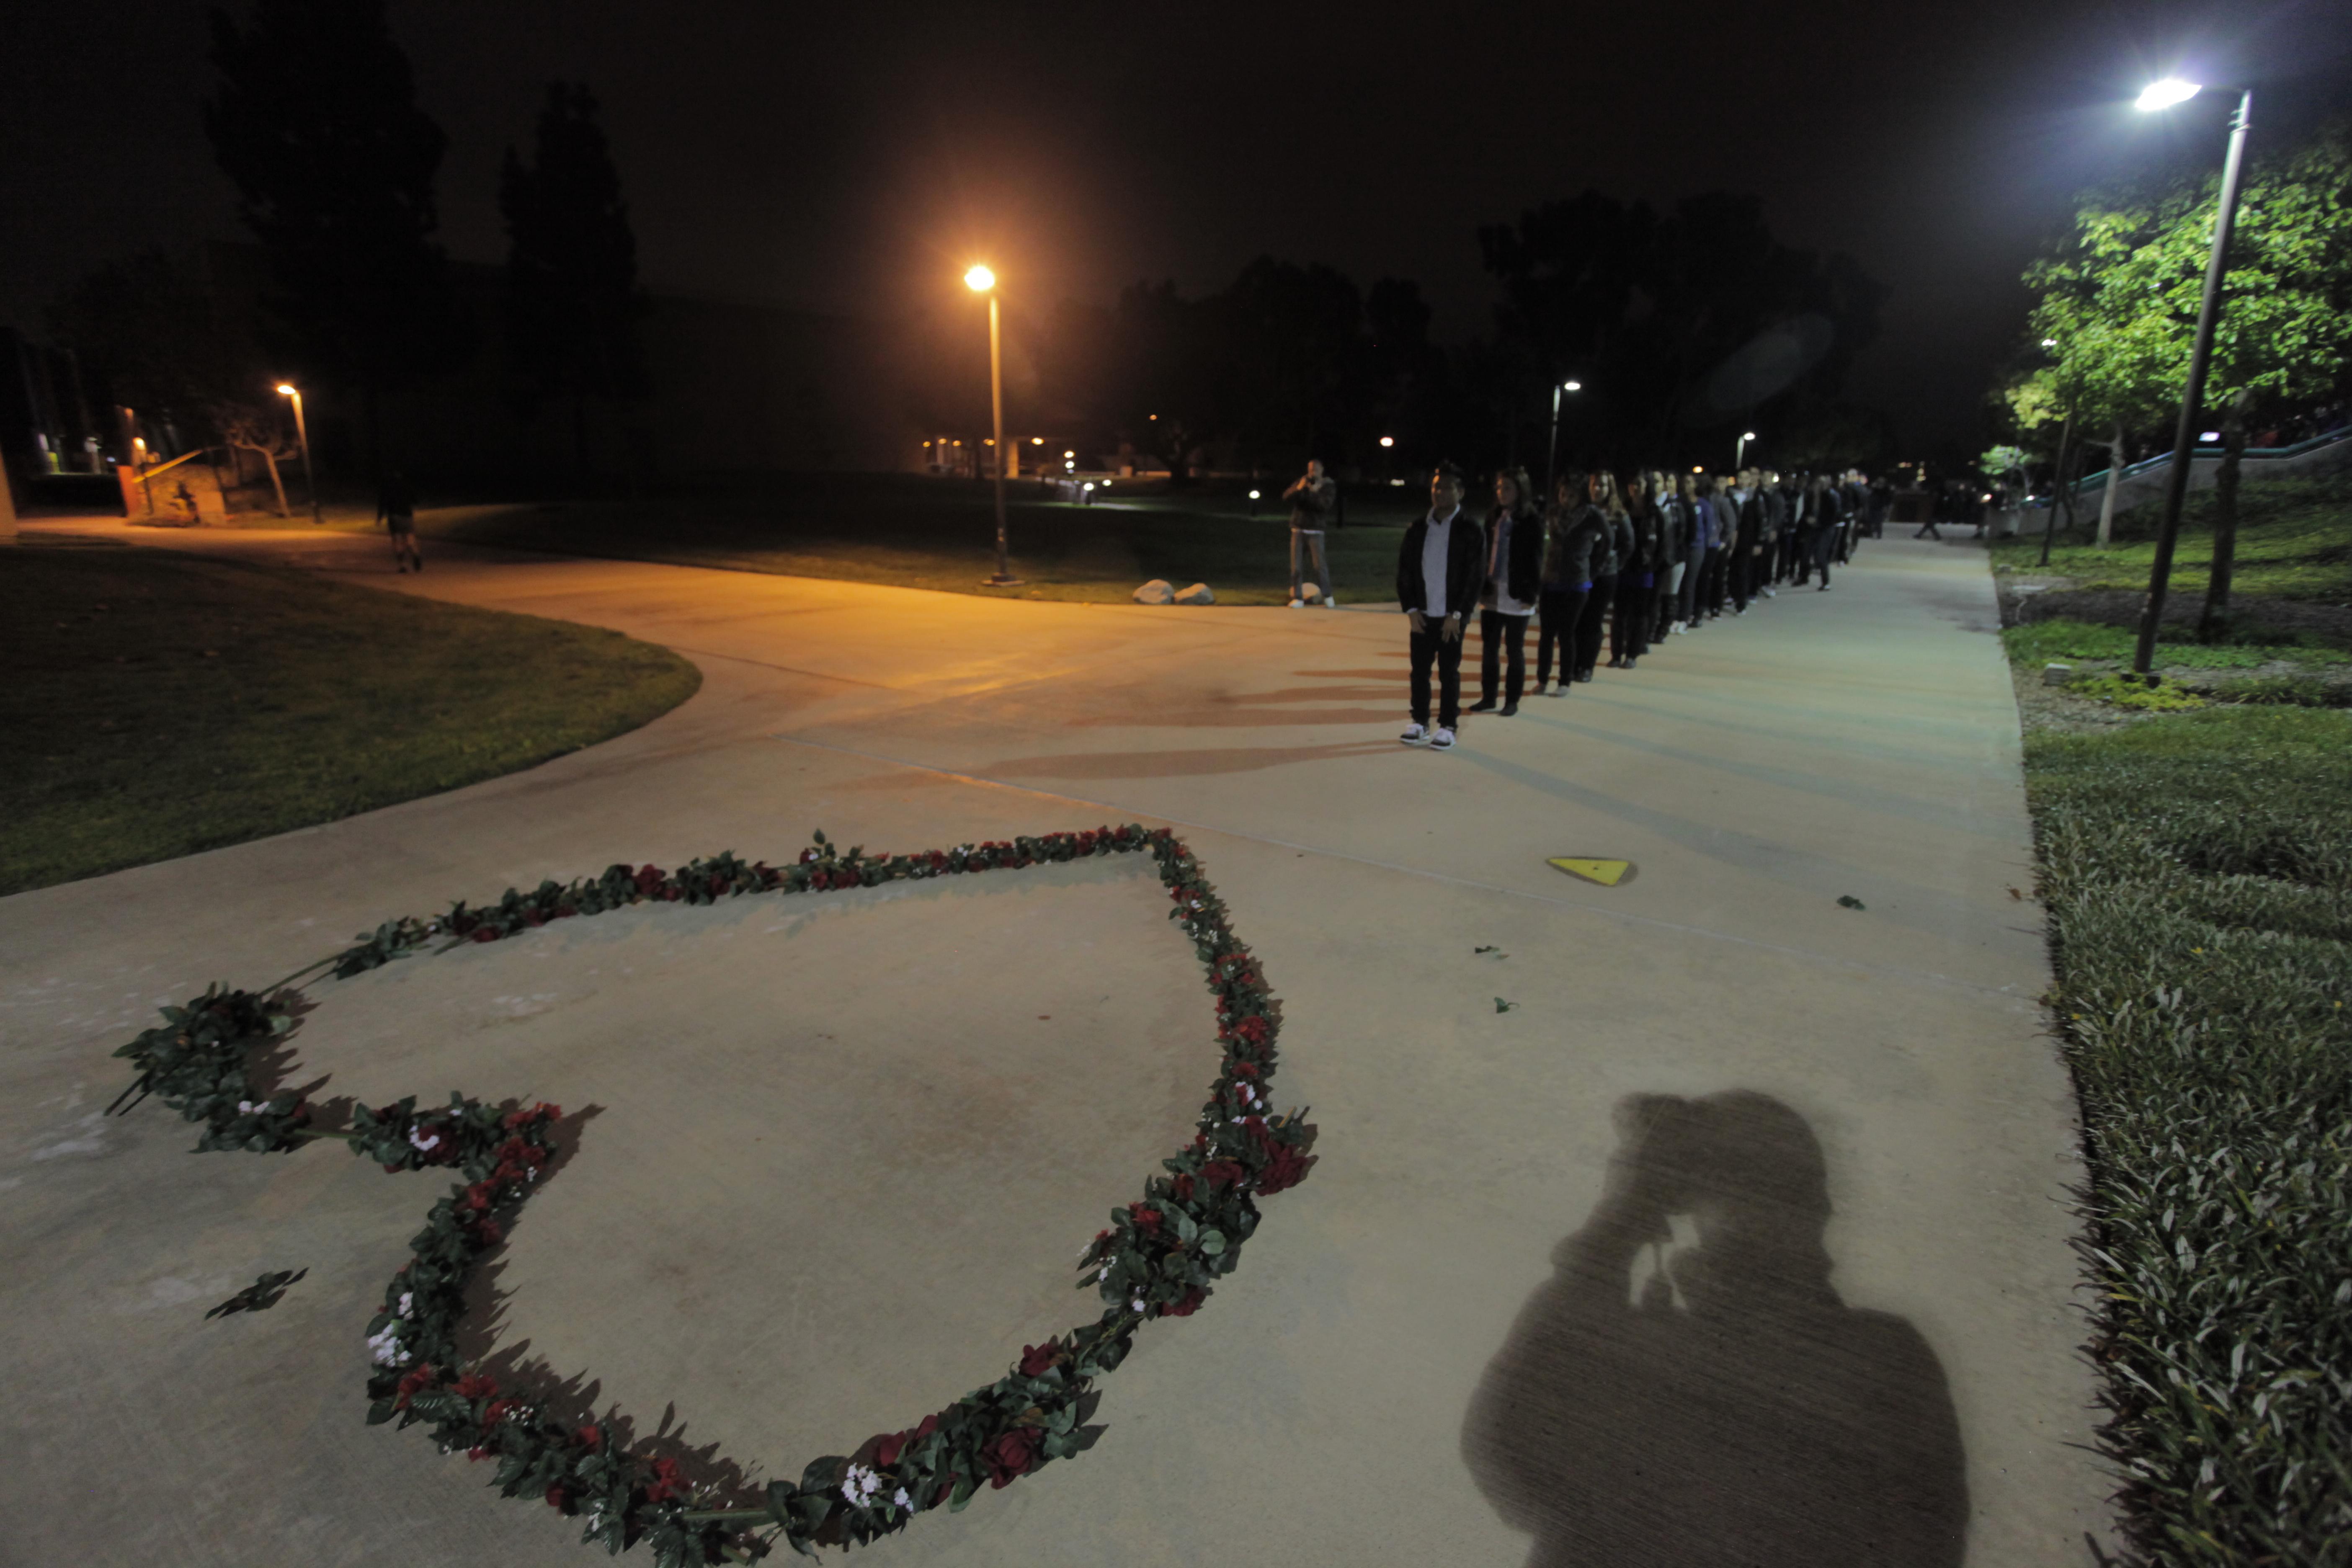 Flash Mob Proposal at Cal State